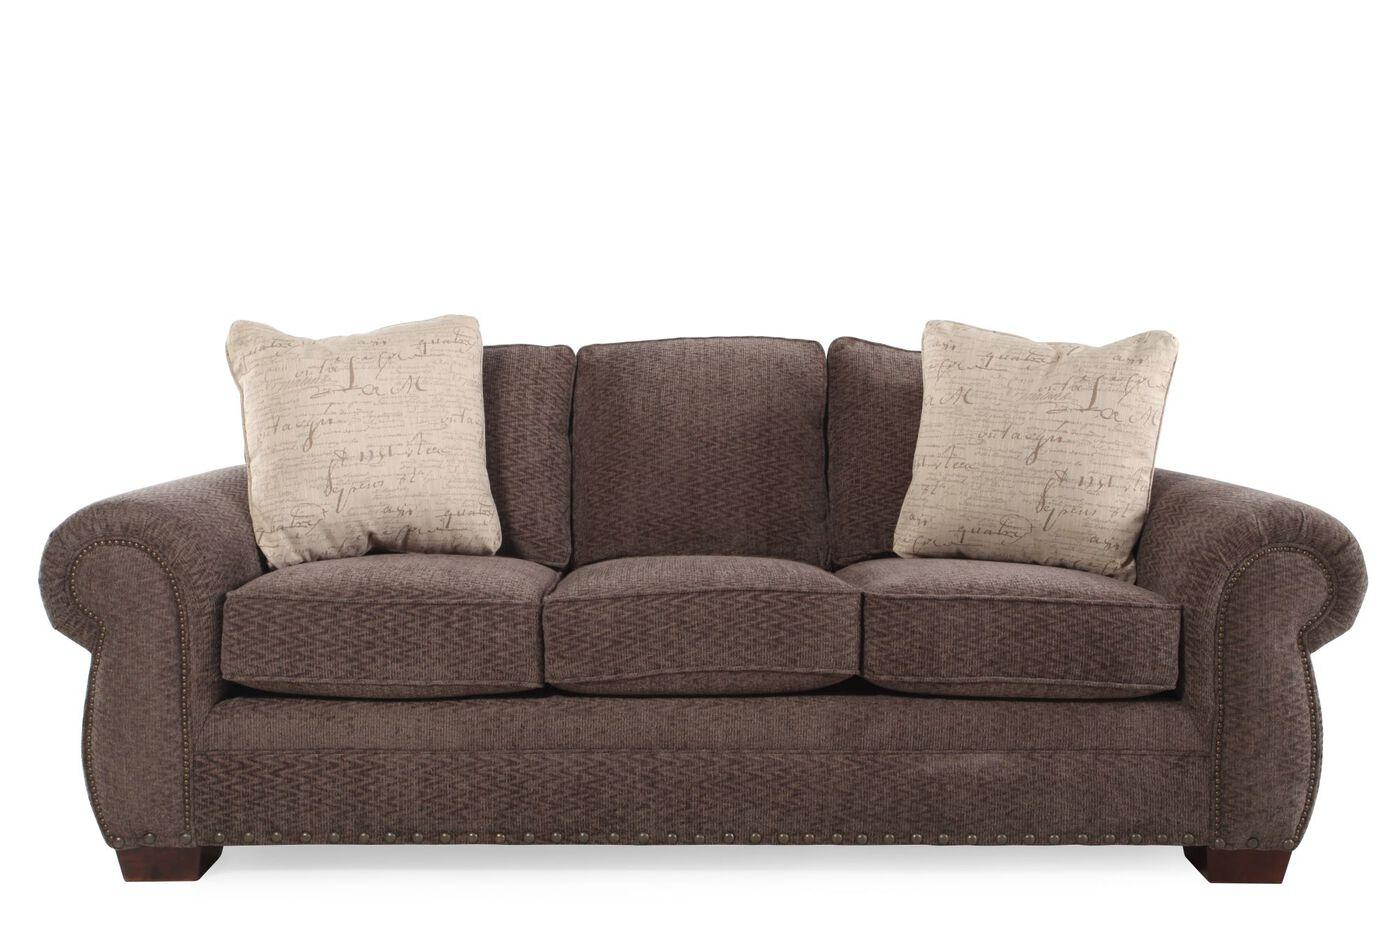 Broyhill Sofa Eigenschaften : Nailhead accented microfiber quot sofa in brown mathis